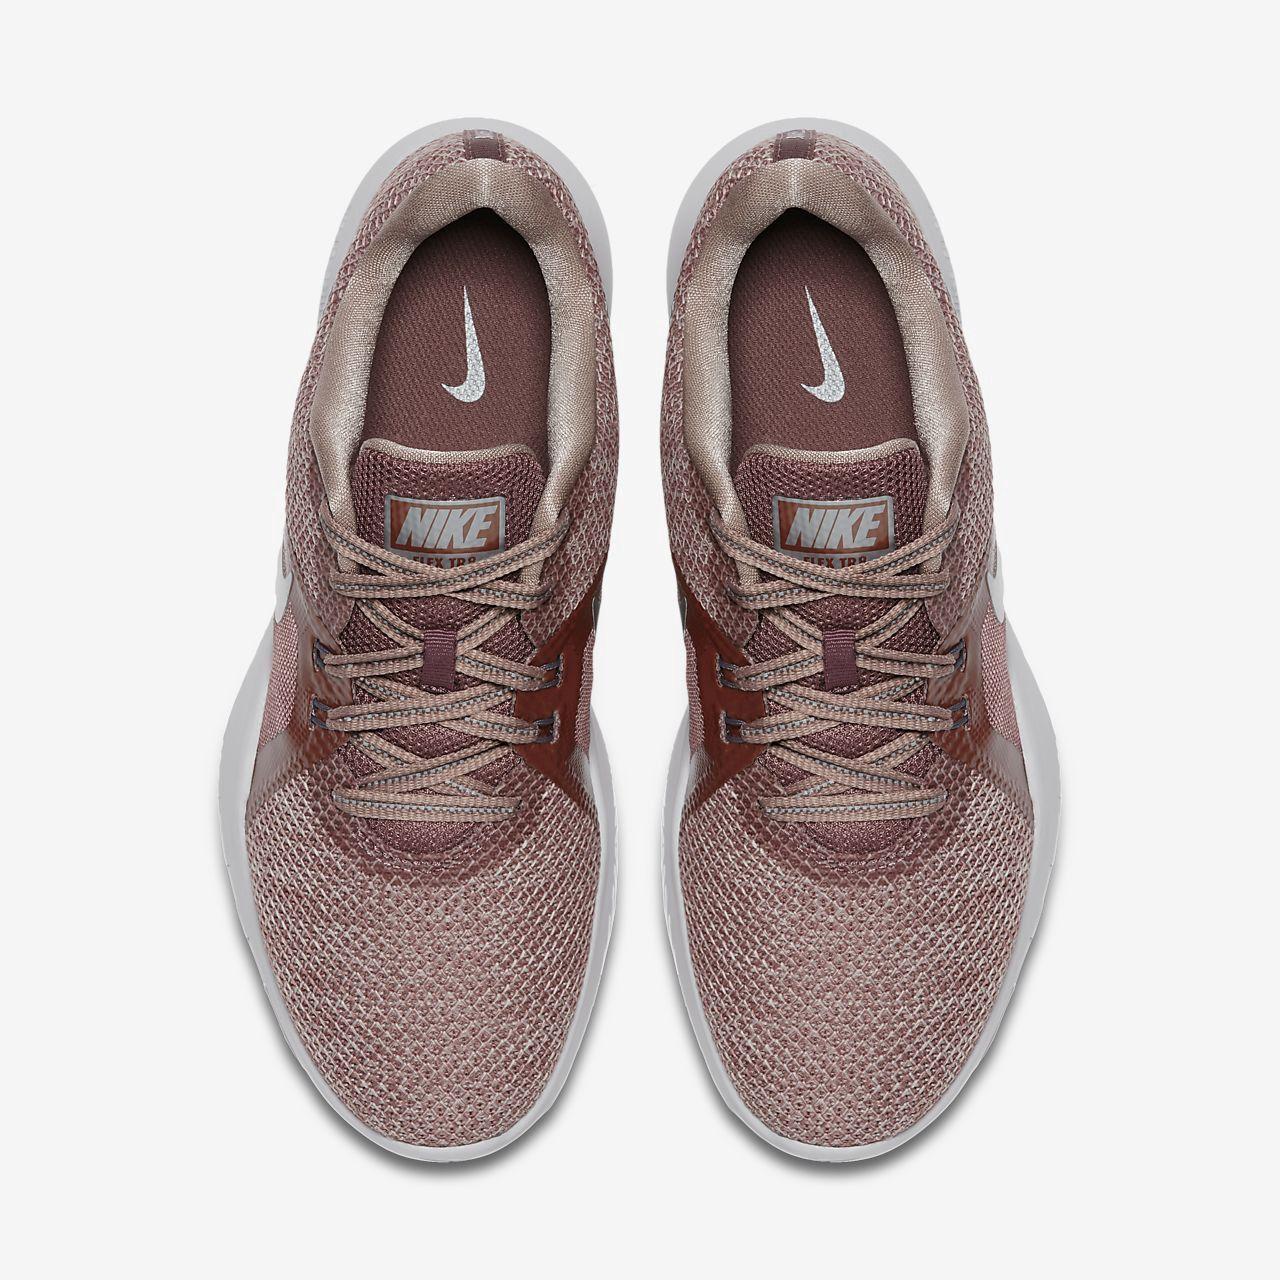 half off 55154 ef8d9 Nike Flex Trainer 8 Premium Womens Training Shoe - 11.5